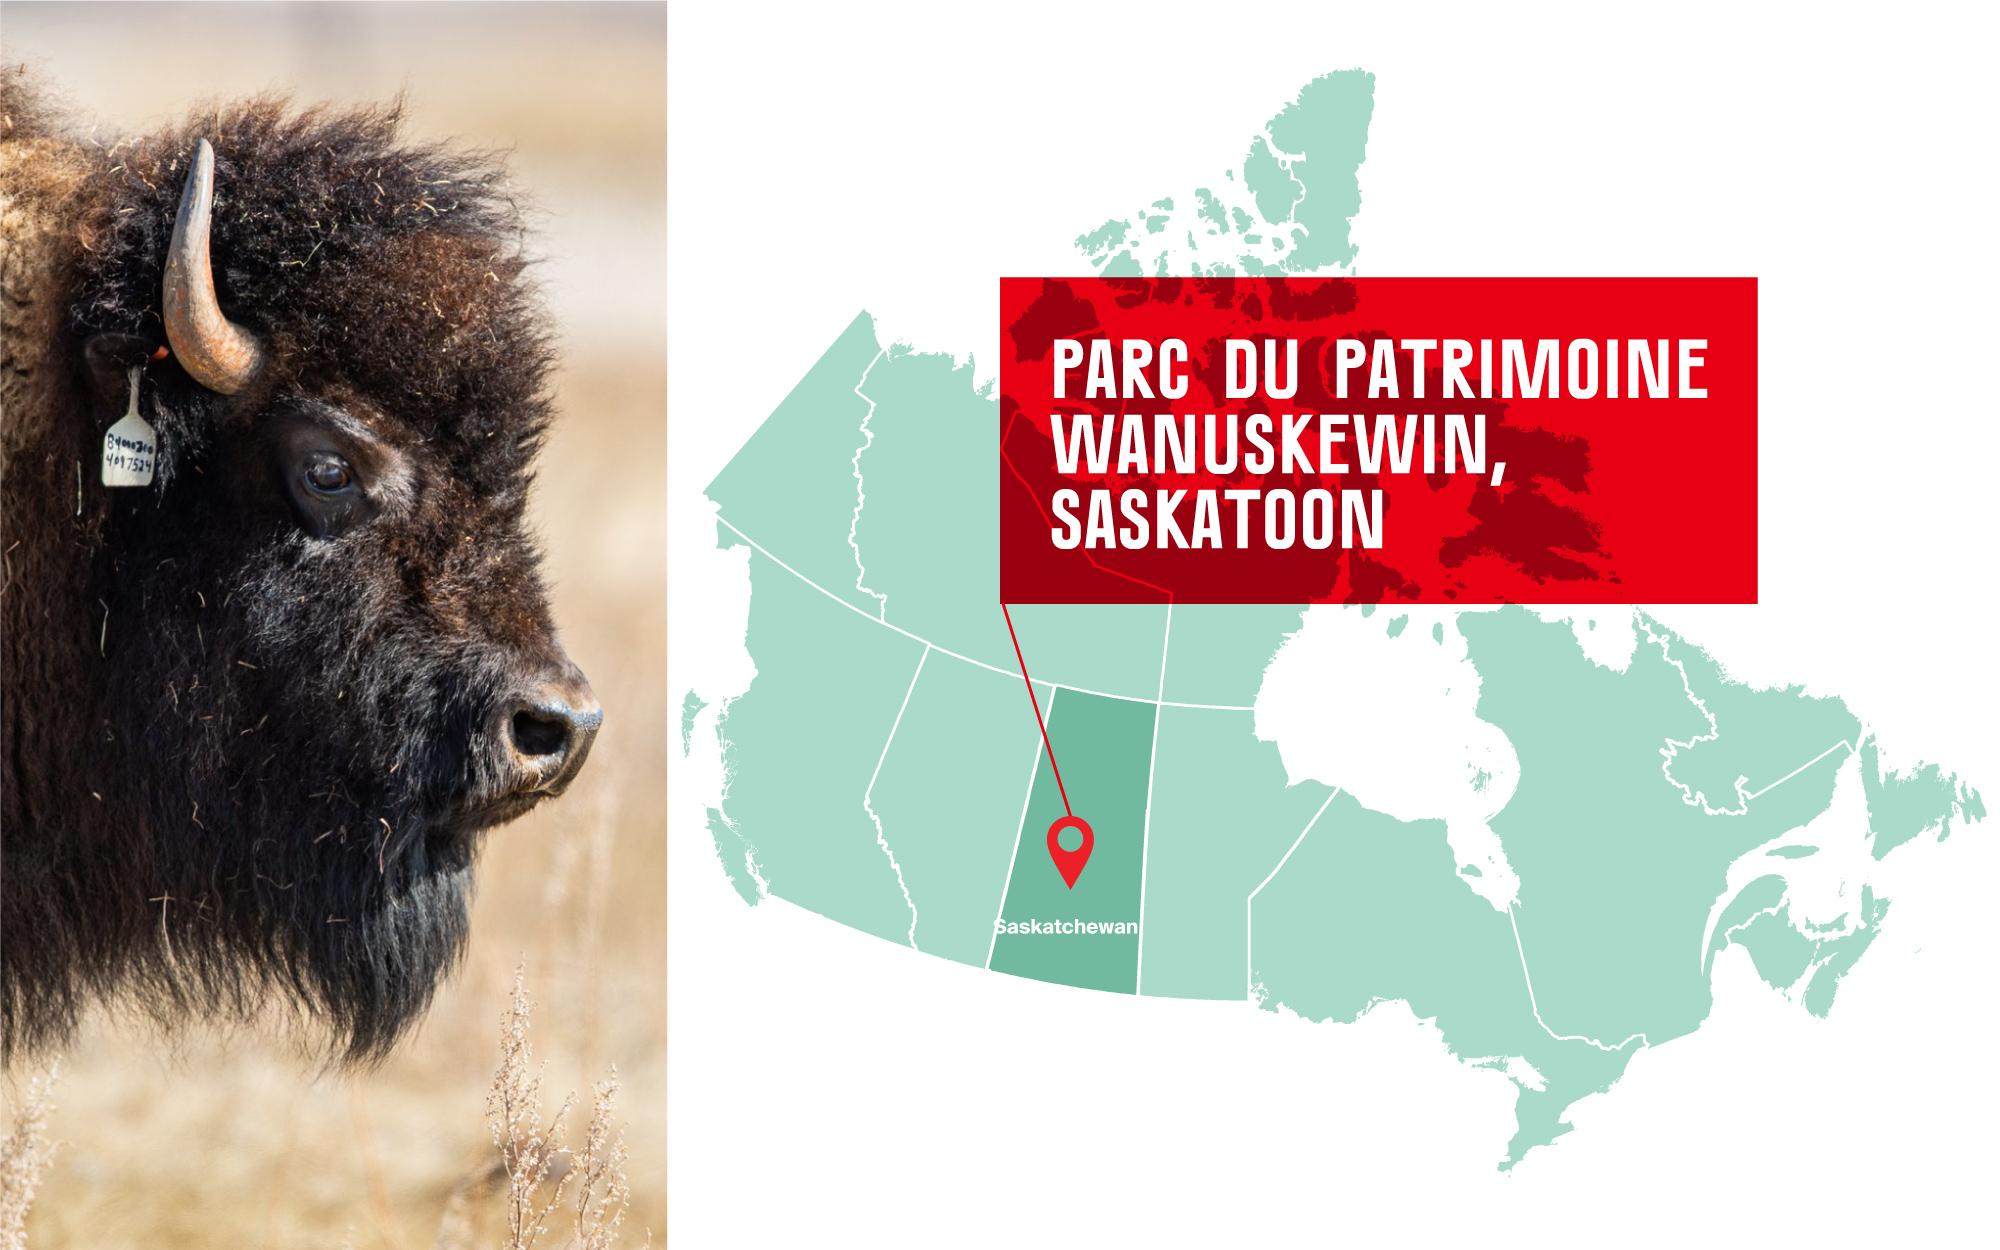 Parc du patrimoine Wanuskewin in Saskatoon